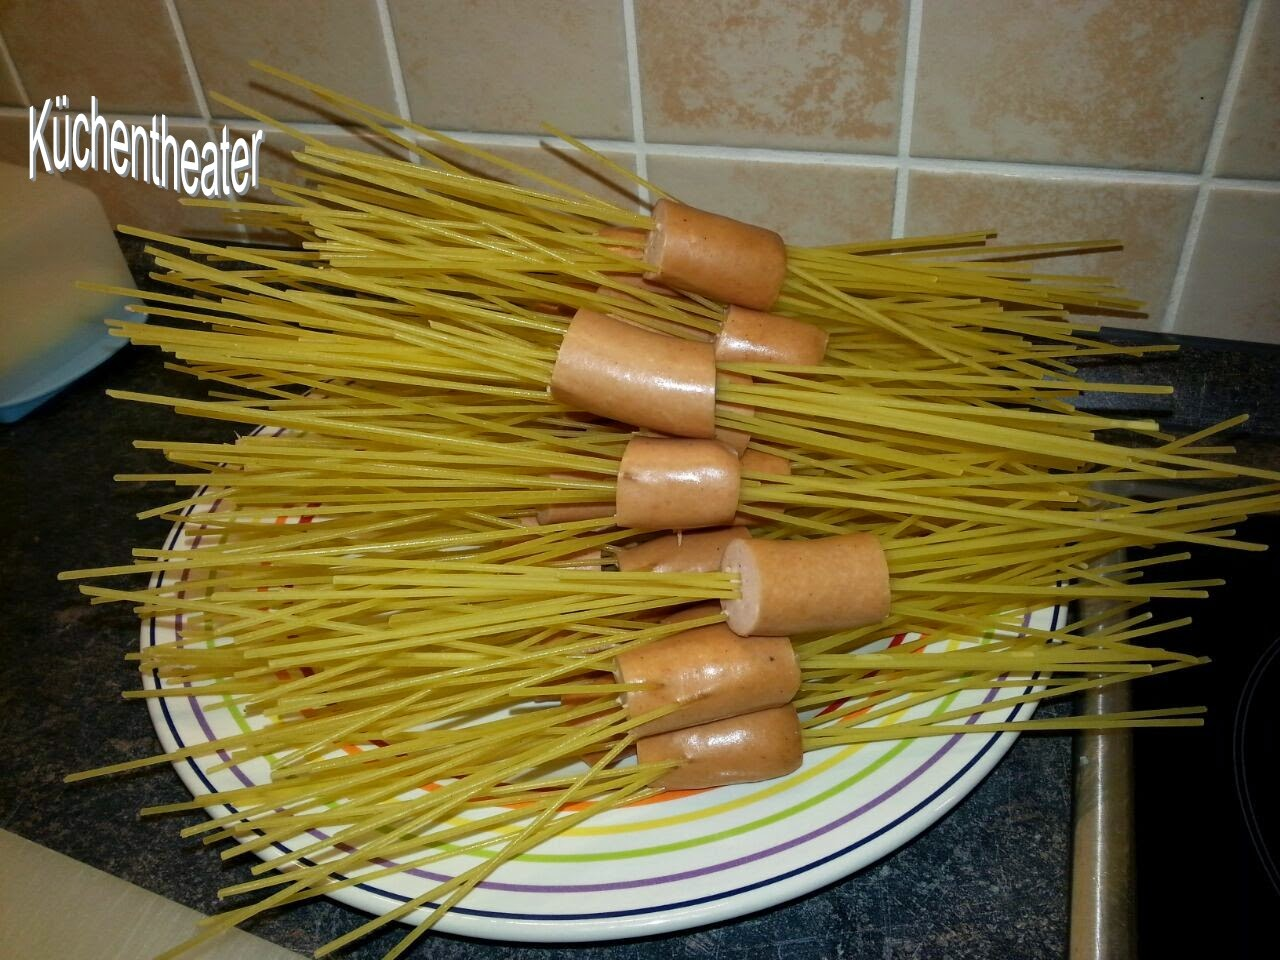 K chentheater spaghetti spinnen kochen f r kinder - Kochen fur kinder thermomix ...